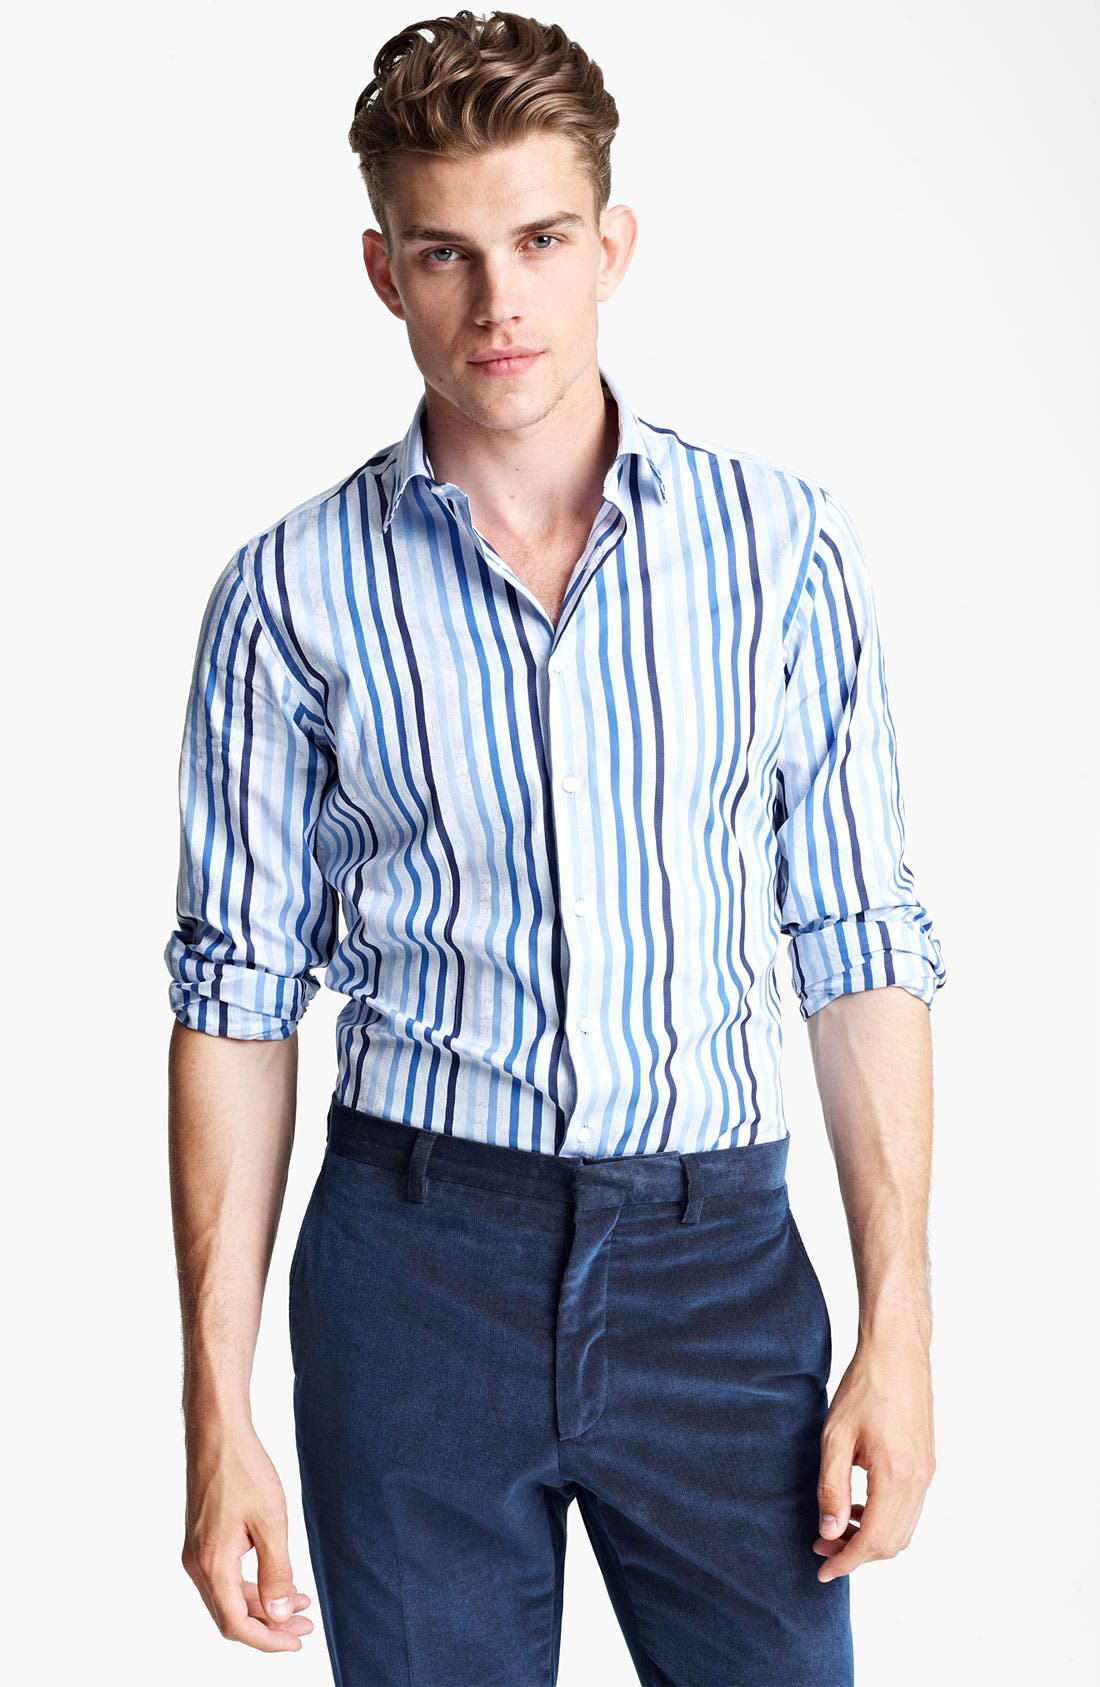 Main Image - Etro Stripe Jacquard Print Dress Shirt